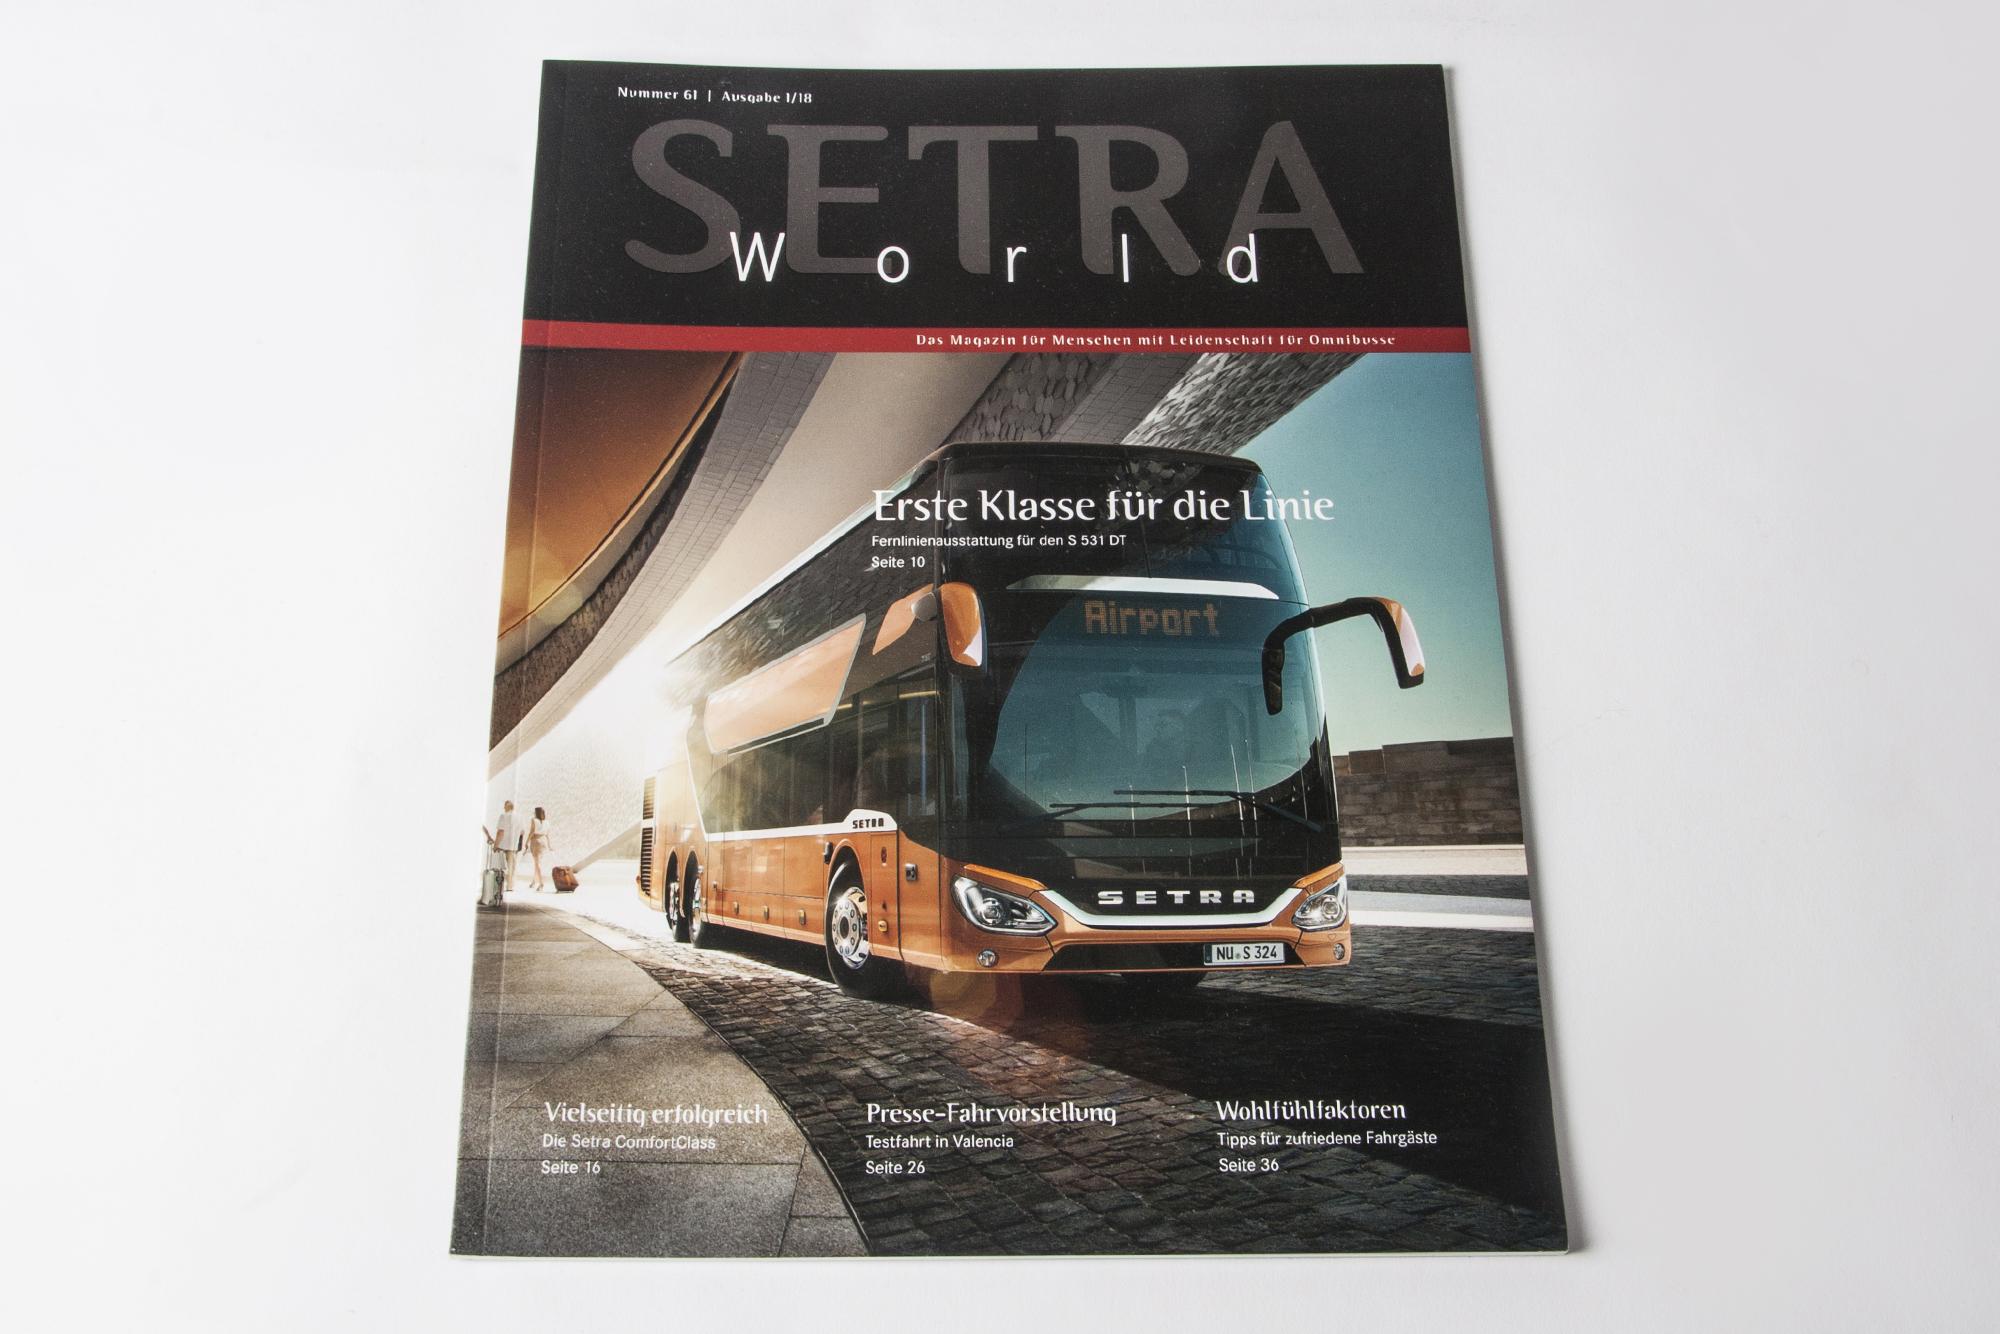 setra_01.jpg